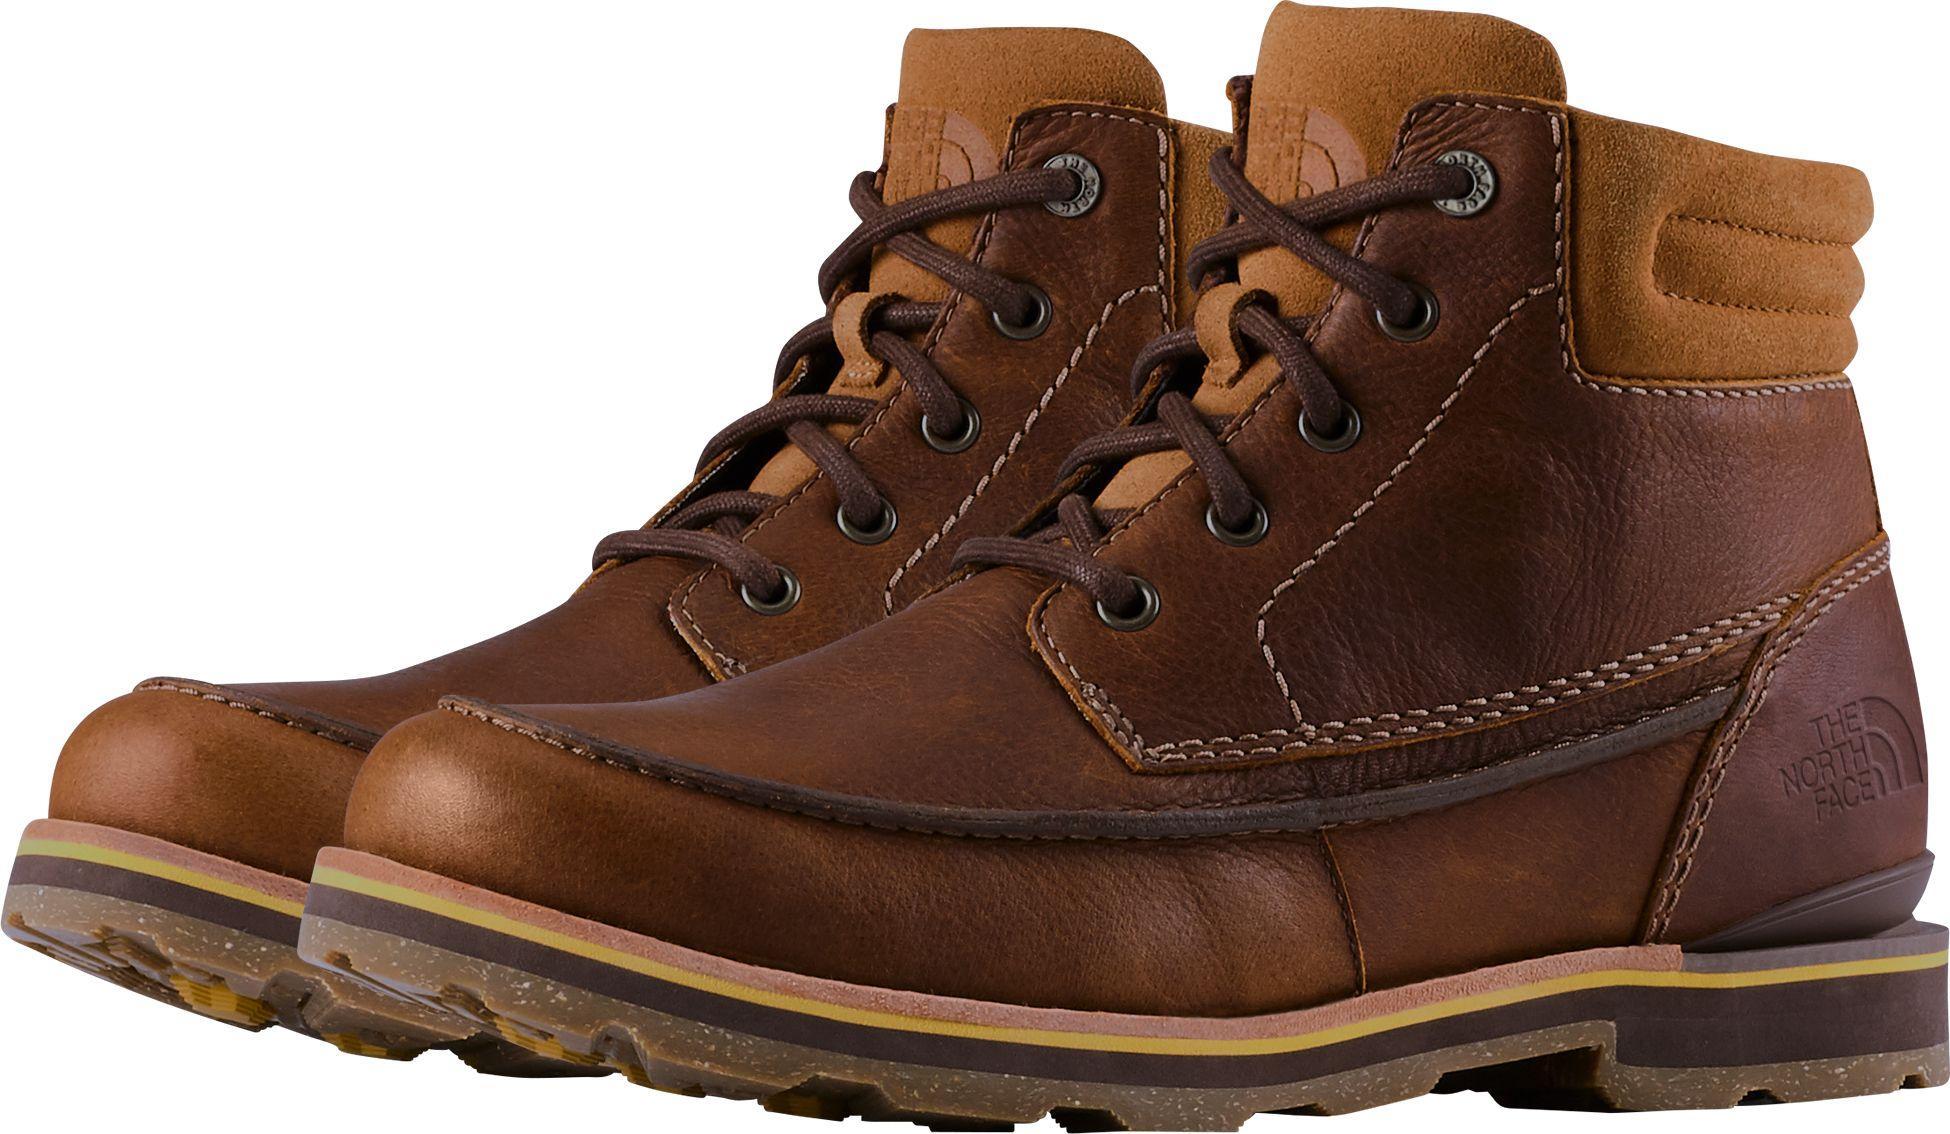 The North Face Leather Bridgeton Chukka